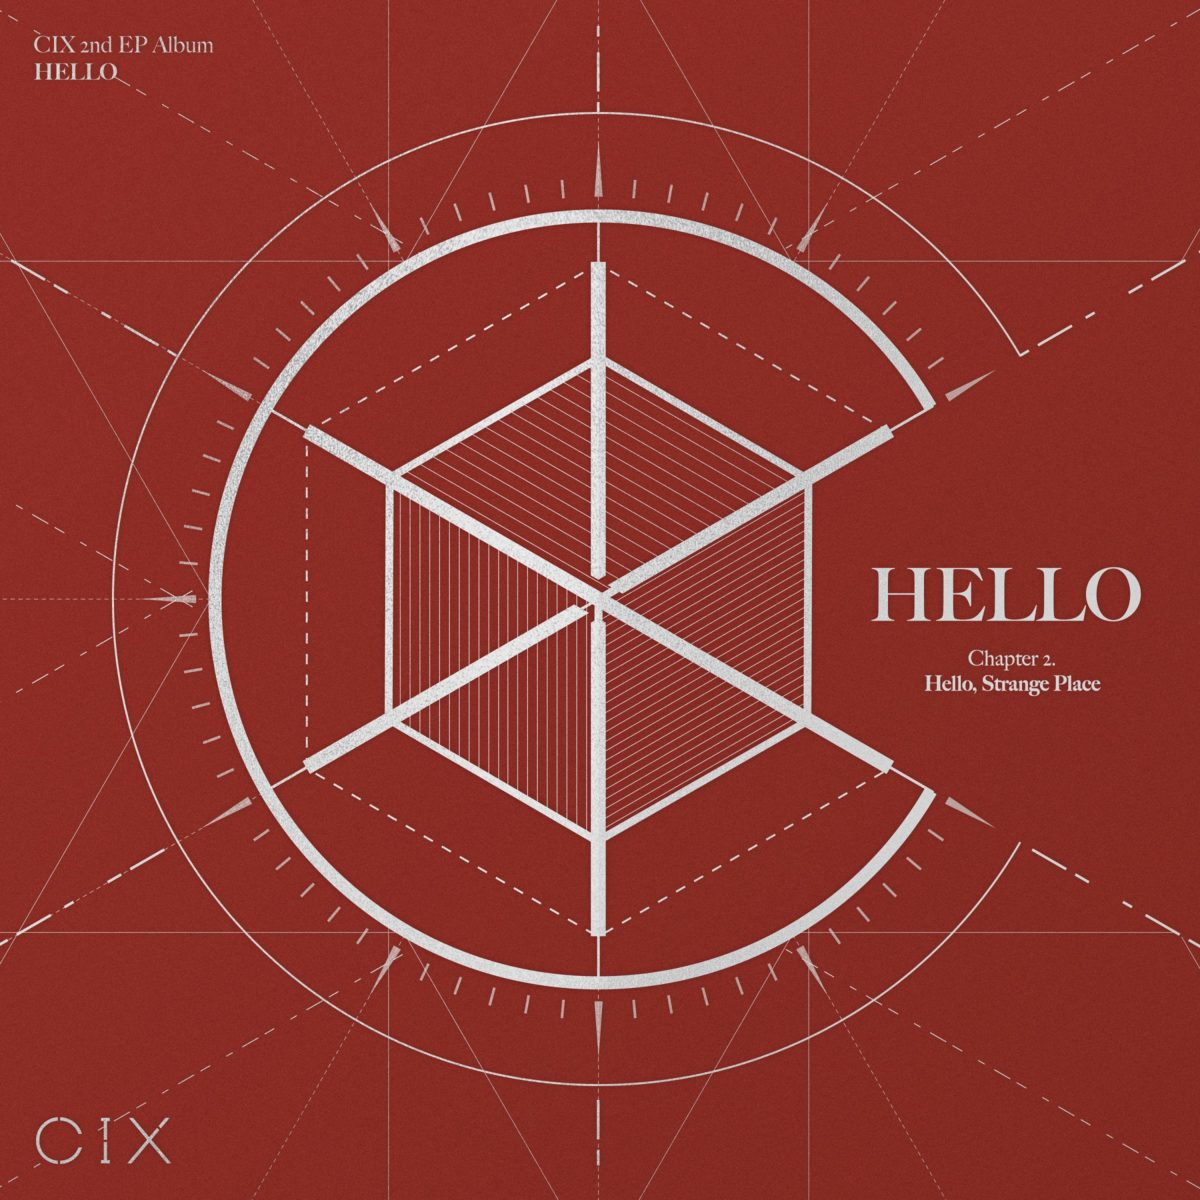 CIX presents 2nd EP Album - HELLO Chapter 2. 'Hello, Strange Place'